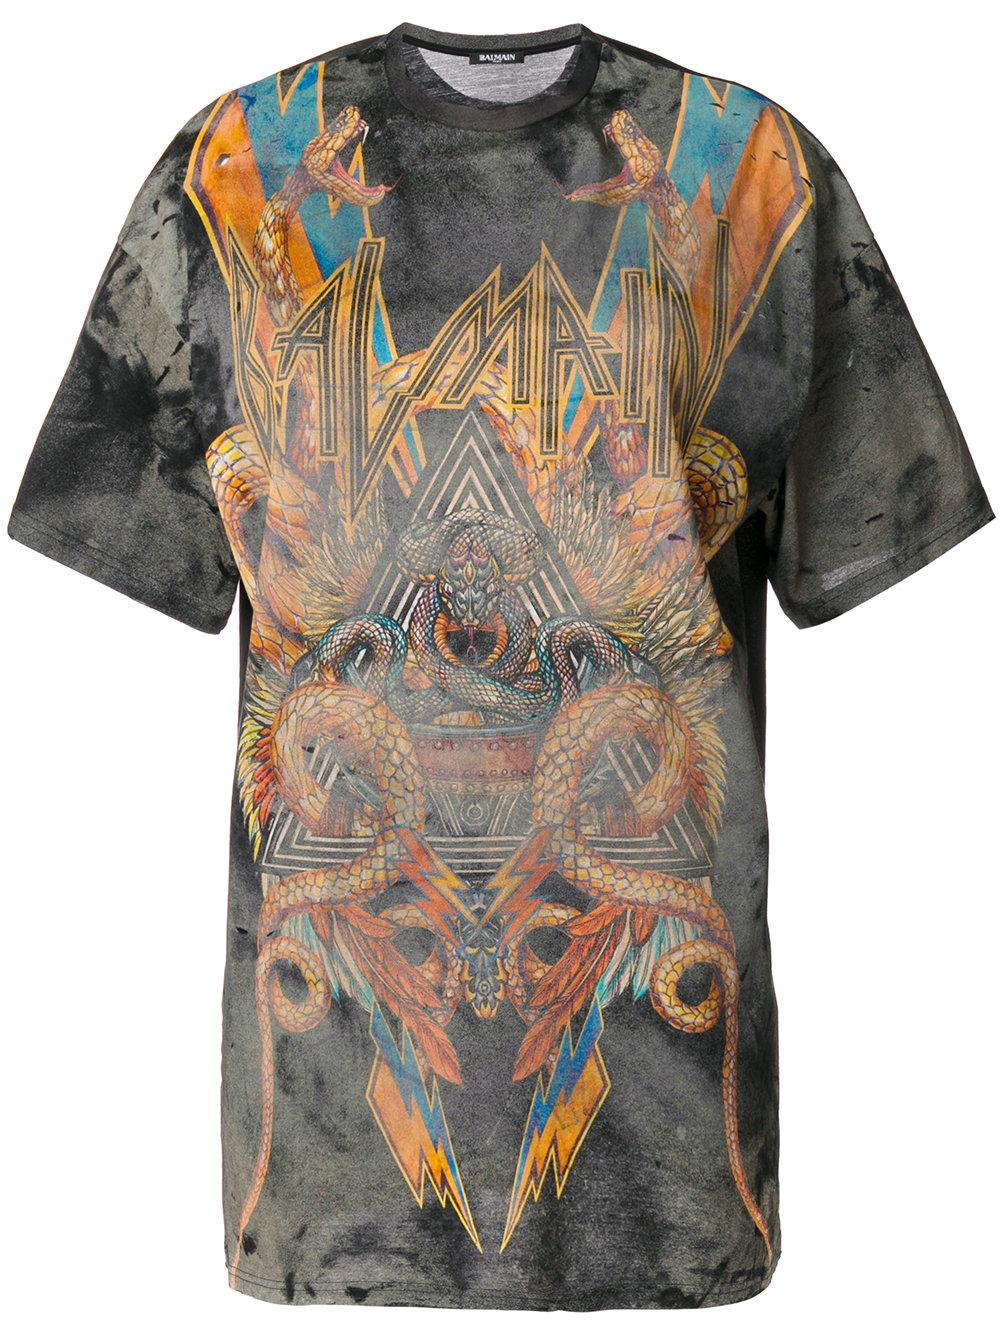 Sale Really 2018 Unisex Cheap Price graphic T-shirt - Multicolour Balmain Footlocker Finishline Online Fashionable Online a6BOuI4